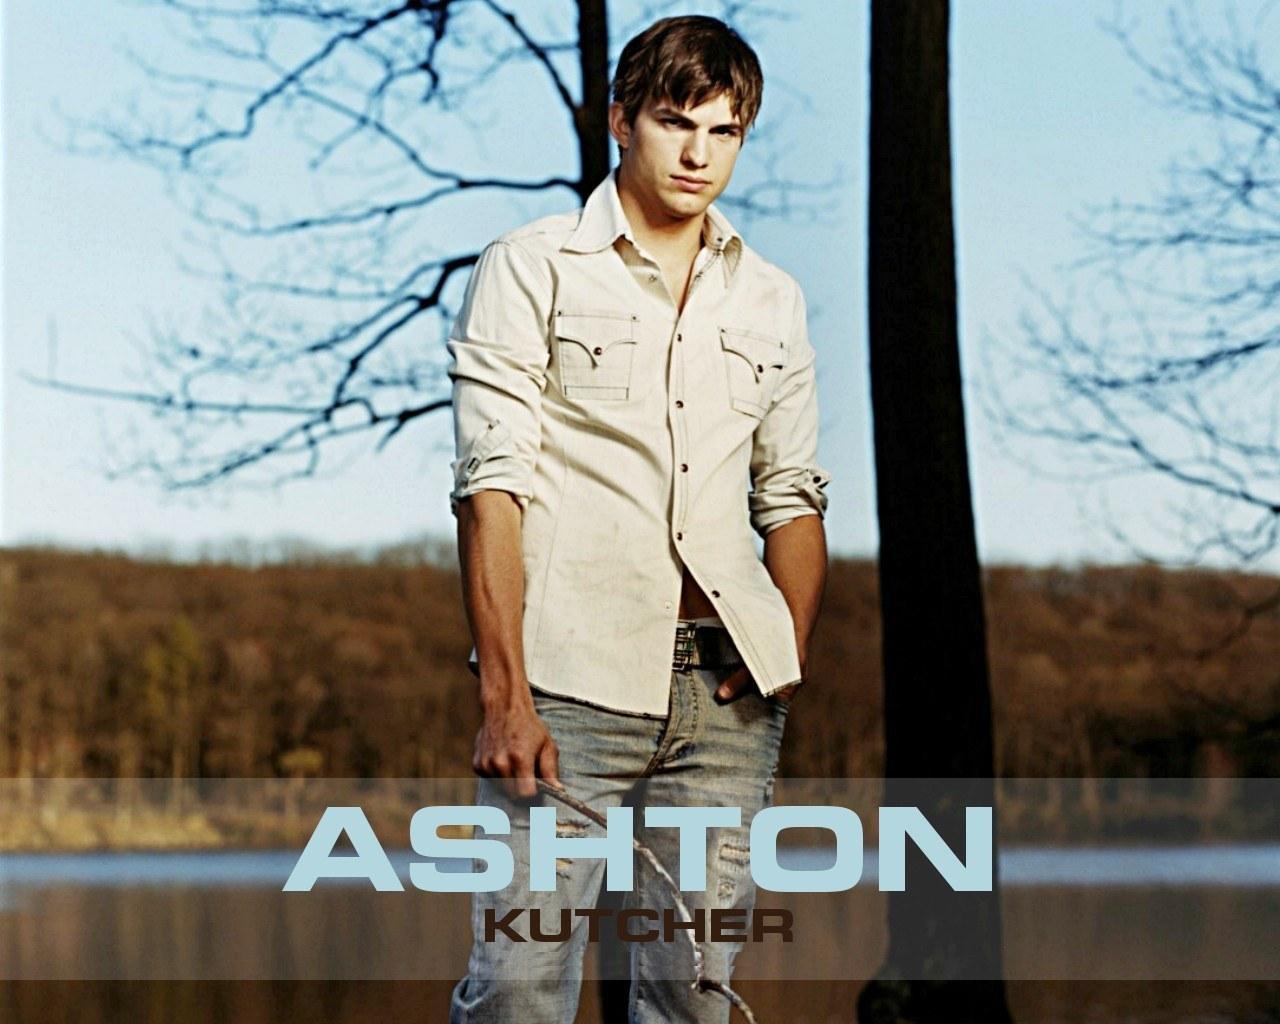 http://1.bp.blogspot.com/_GxPqfHOuYyc/TAcqY3EwgOI/AAAAAAAAB0s/uasbu09gDMU/s1600/Ashton-ashton-kutcher-3325018-1280-1024.jpg